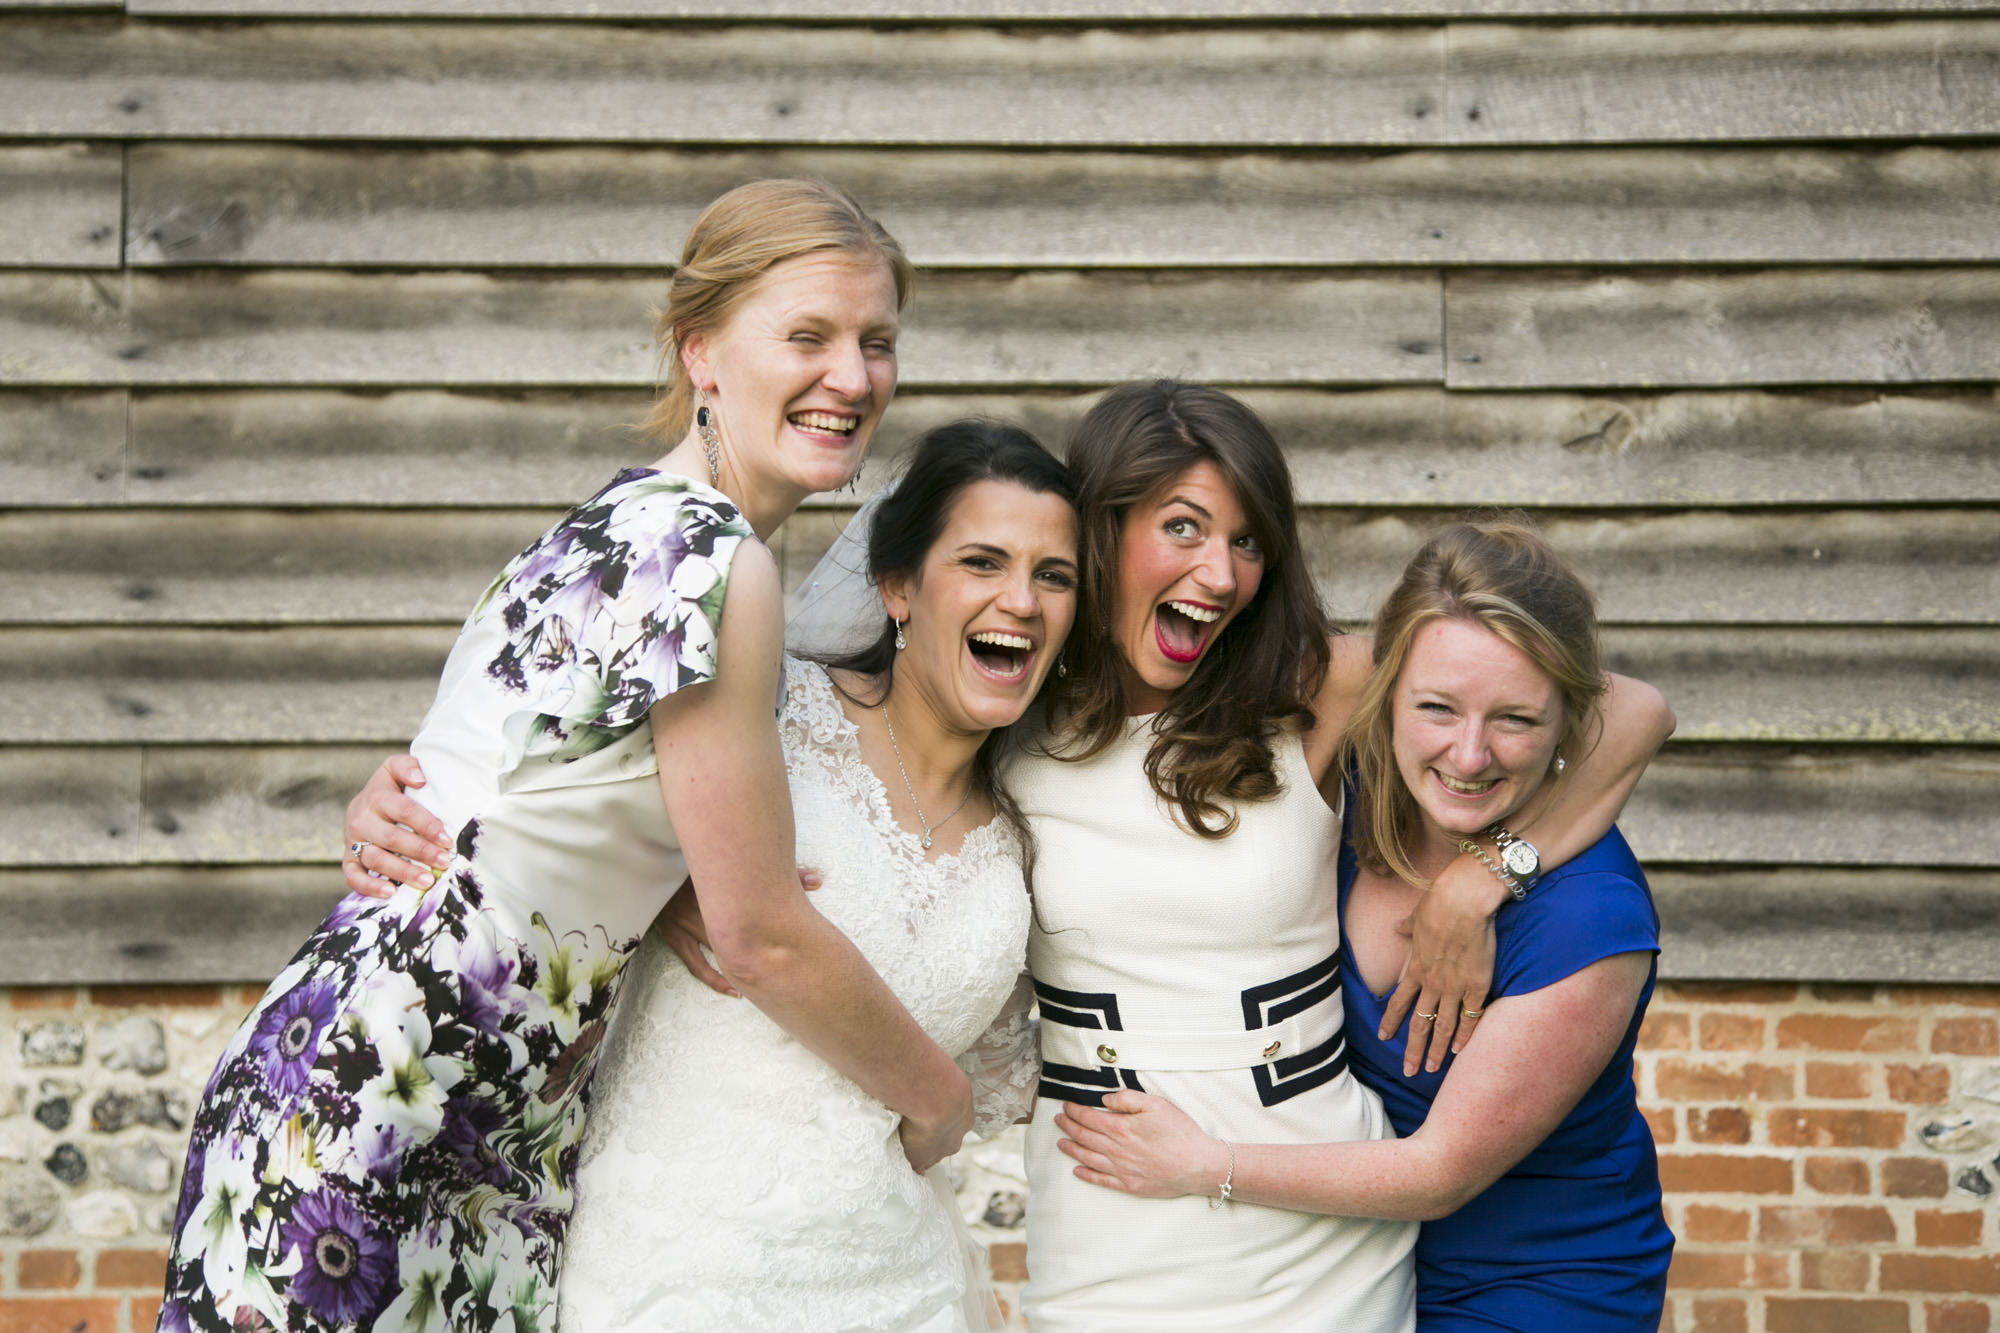 cambridge-wedding-photographer-io-1680-650.jpg